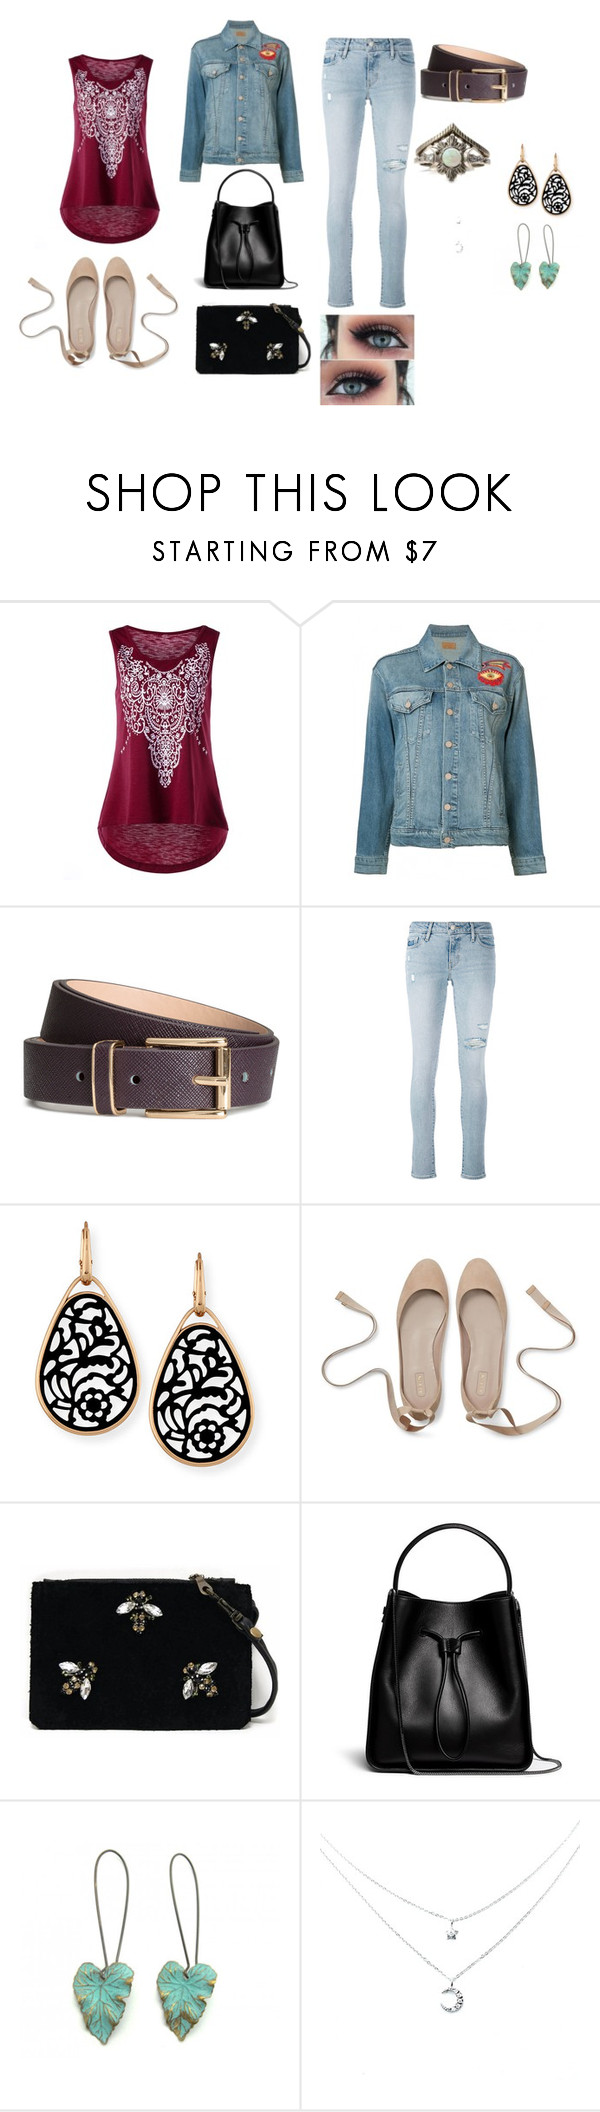 BBQ by loglady02 on Polyvore featuring moda, Mother, Levi's, Angela Valentine Handbags, 3.1 Phillip Lim, Zara Taylor and Pomellato